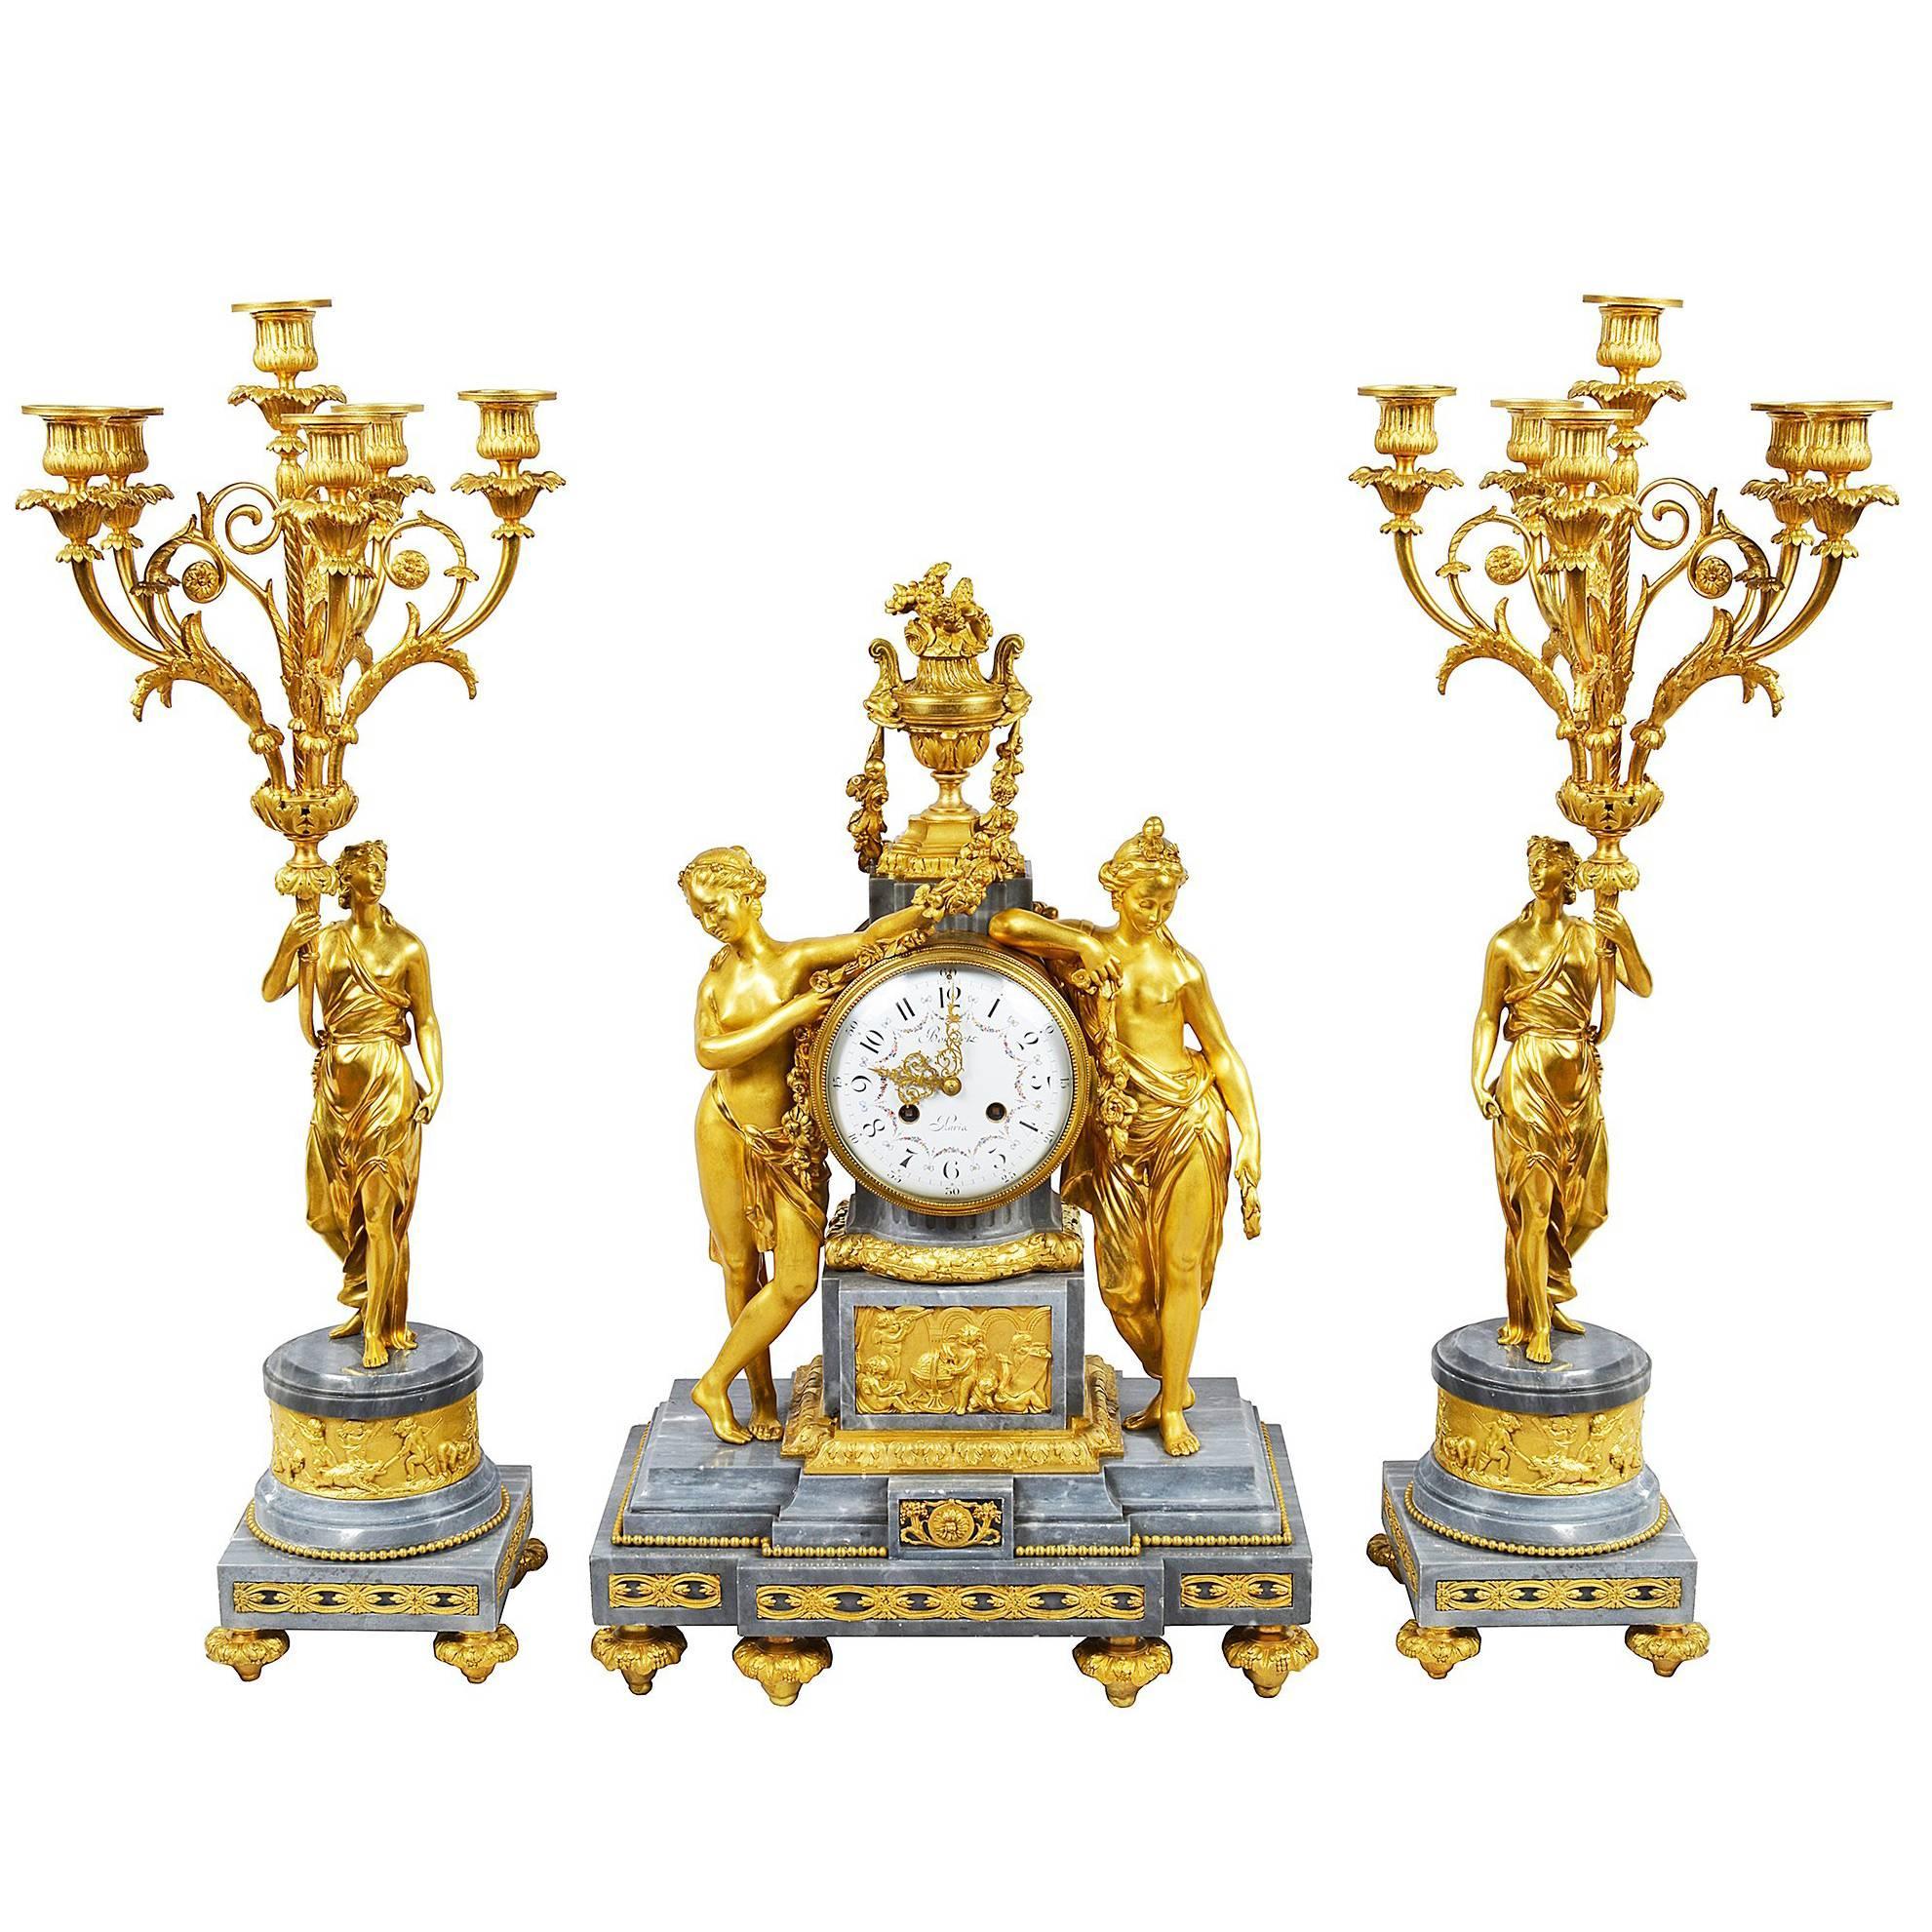 French Louis XVI Style Gilded Clock Set, 19th Century